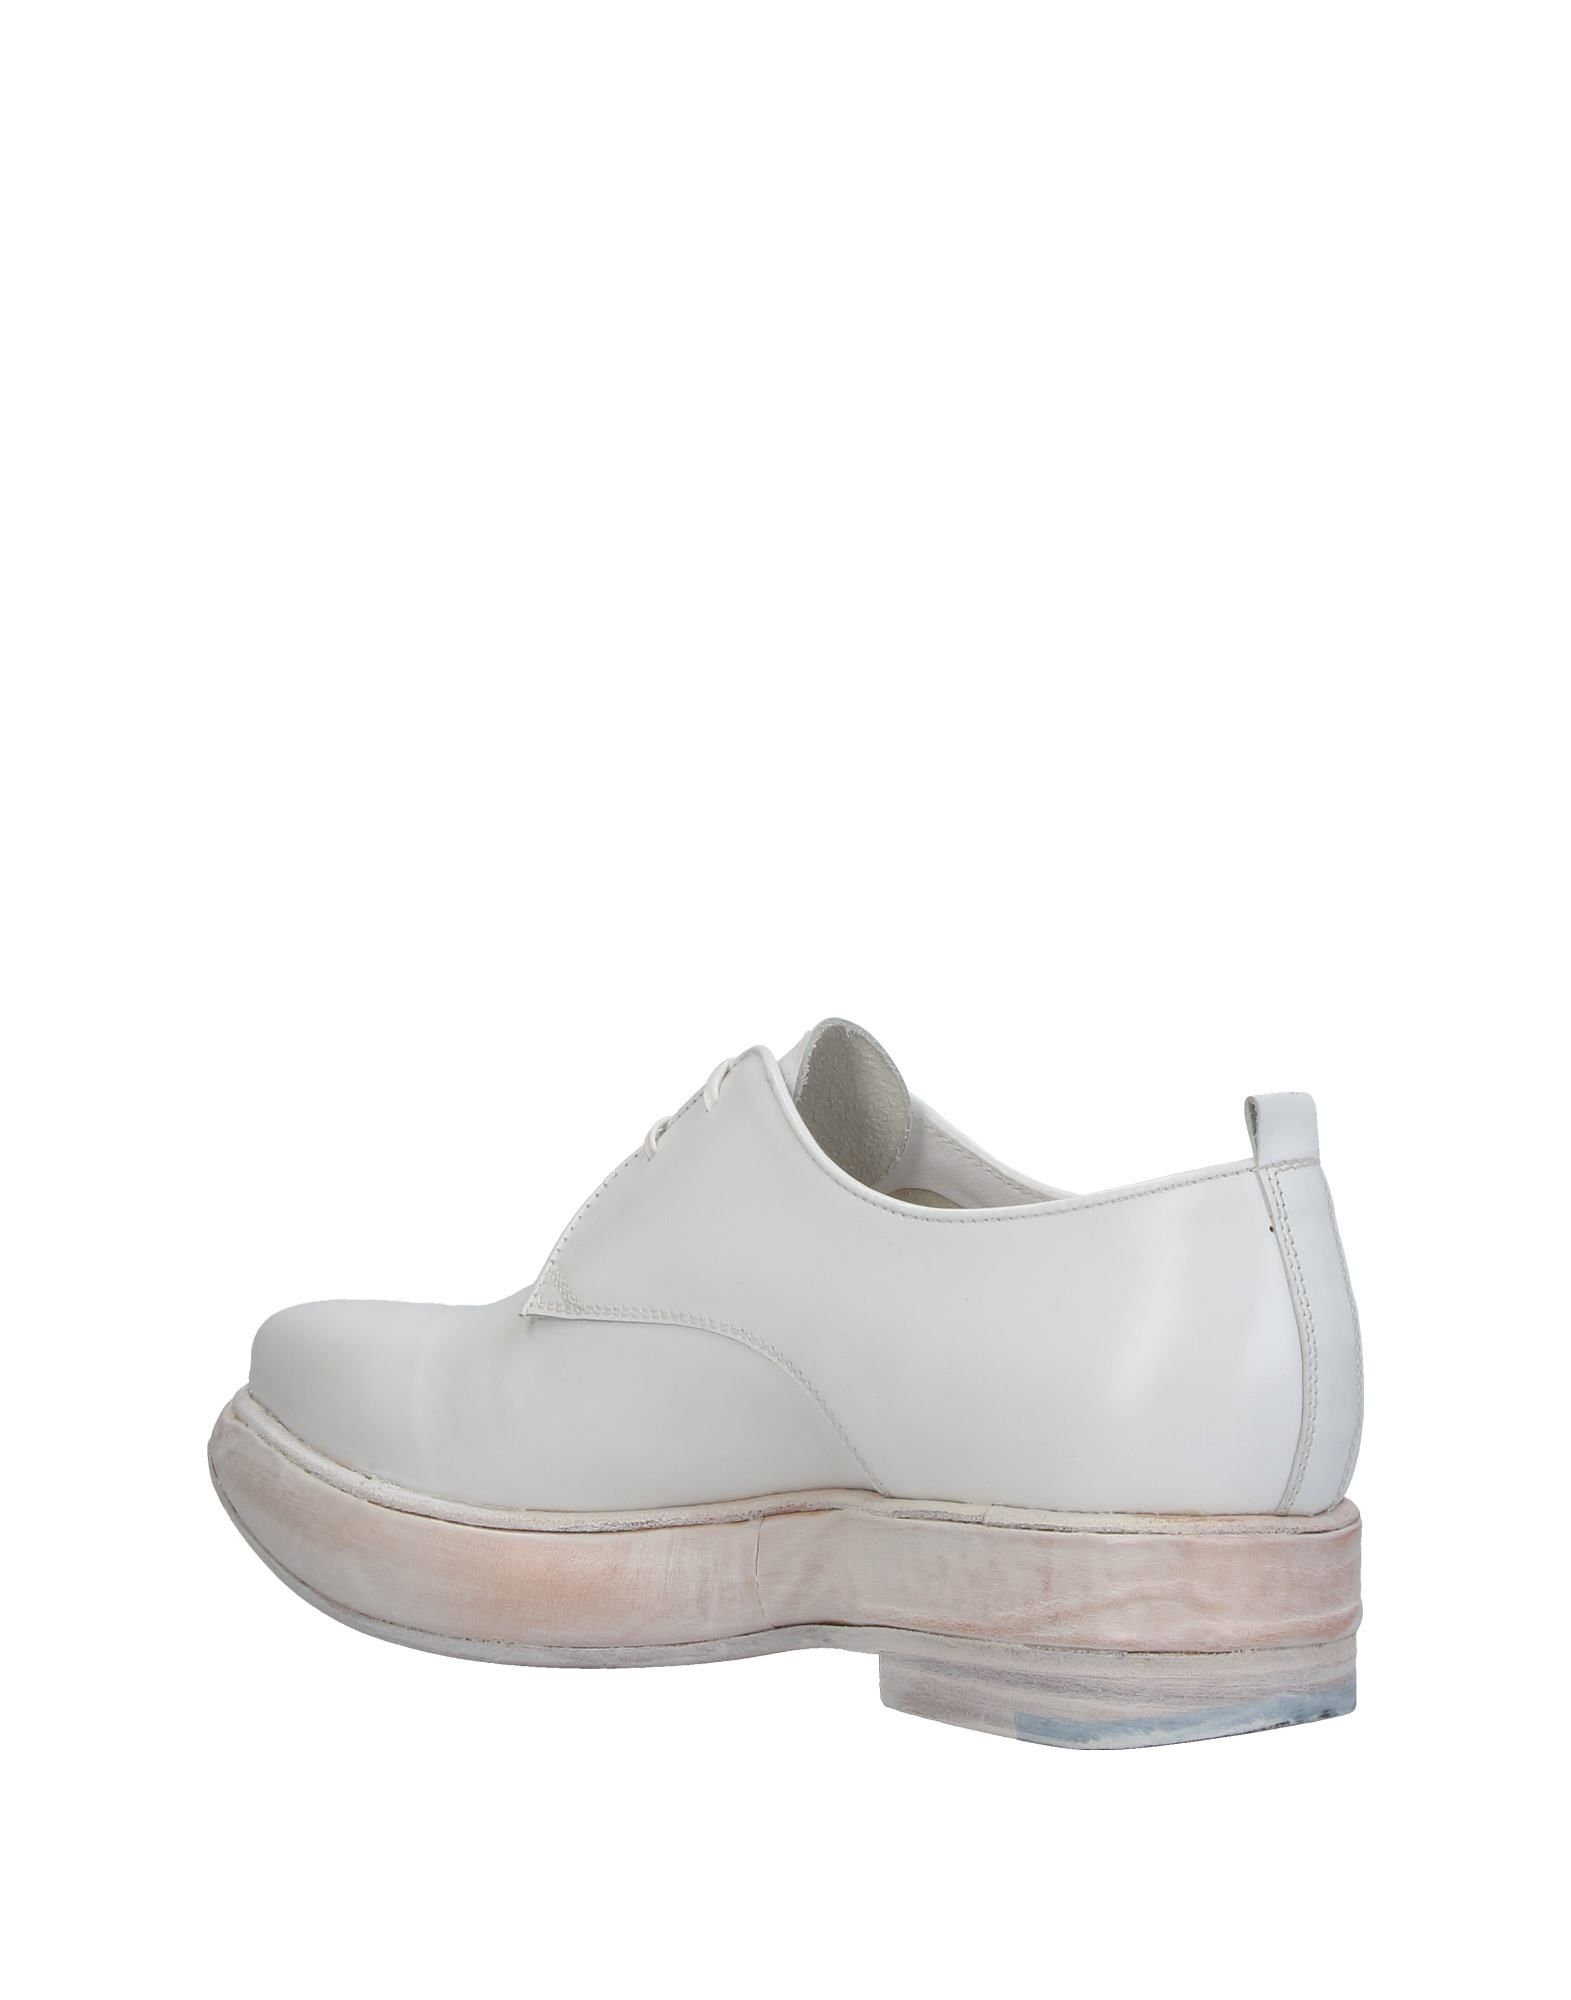 Rocco 11410384BQ P. Schnürschuhe Damen  11410384BQ Rocco Gute Qualität beliebte Schuhe c1e20a